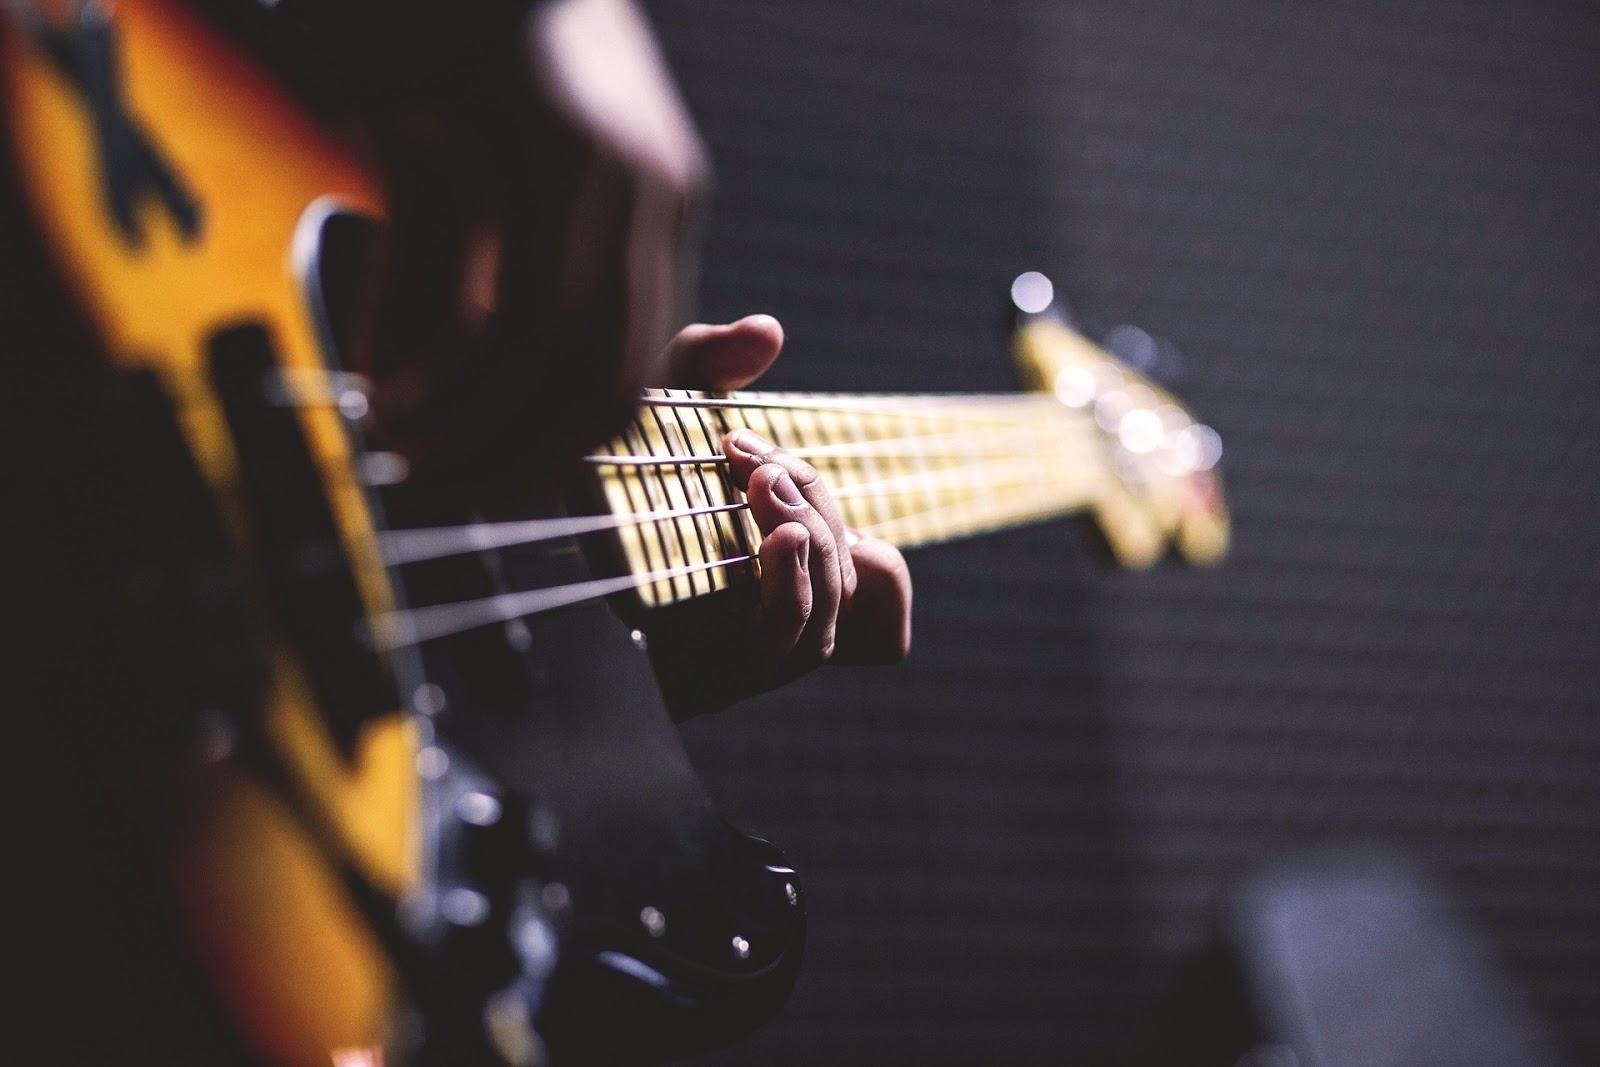 Awargi Guitar Chords Love Games A2z Guitar Tab